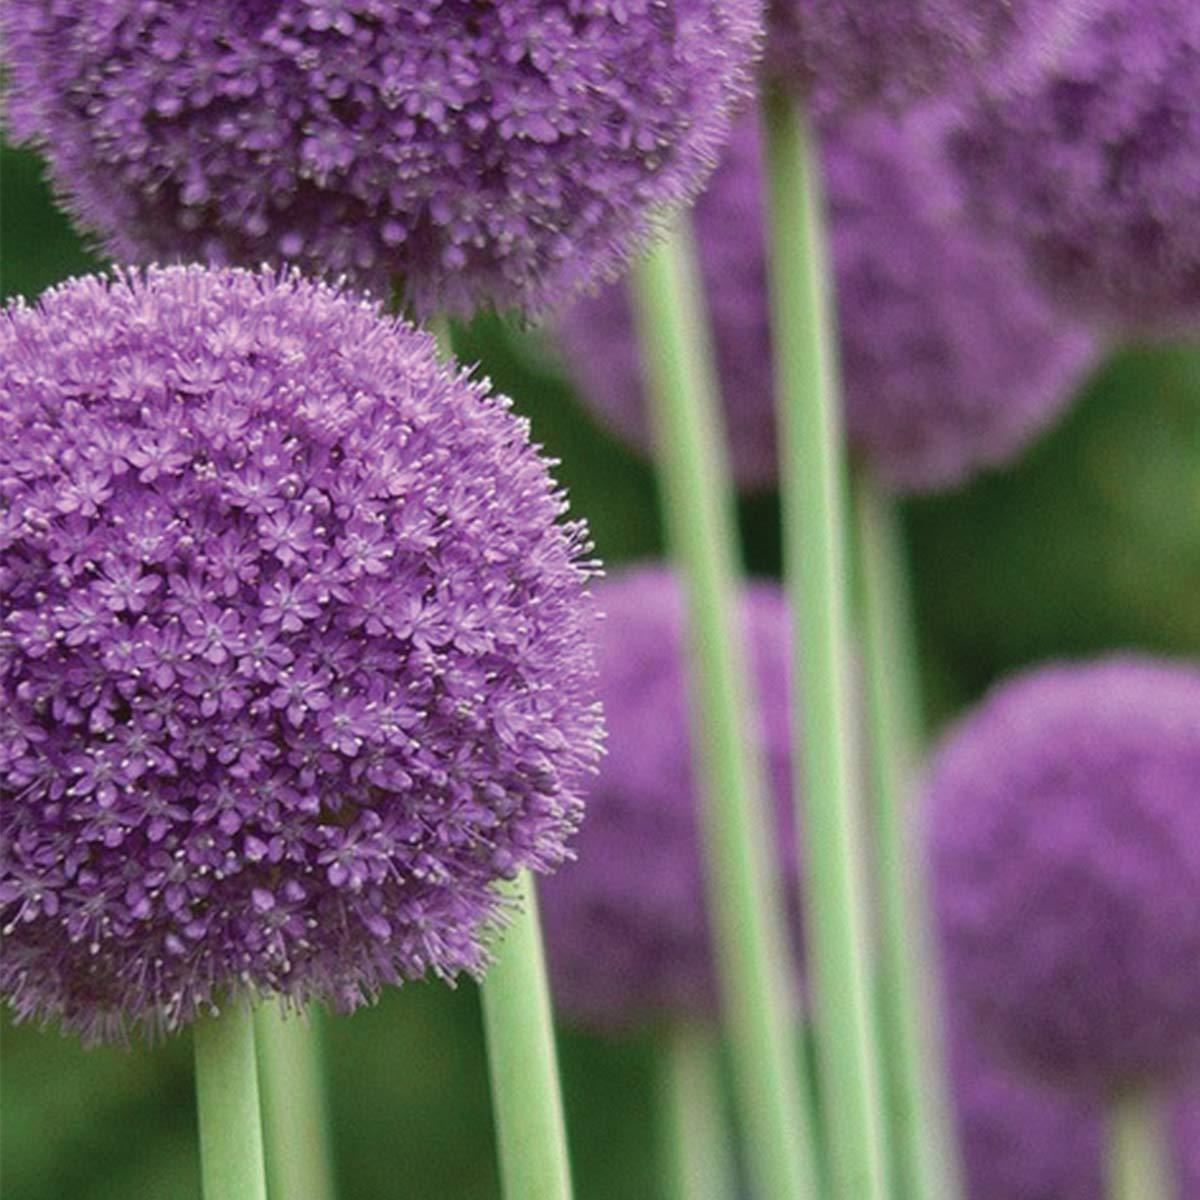 Burpee Allium Giganteum   3 Large Flowering Fall Bulbs for Planting, Purple